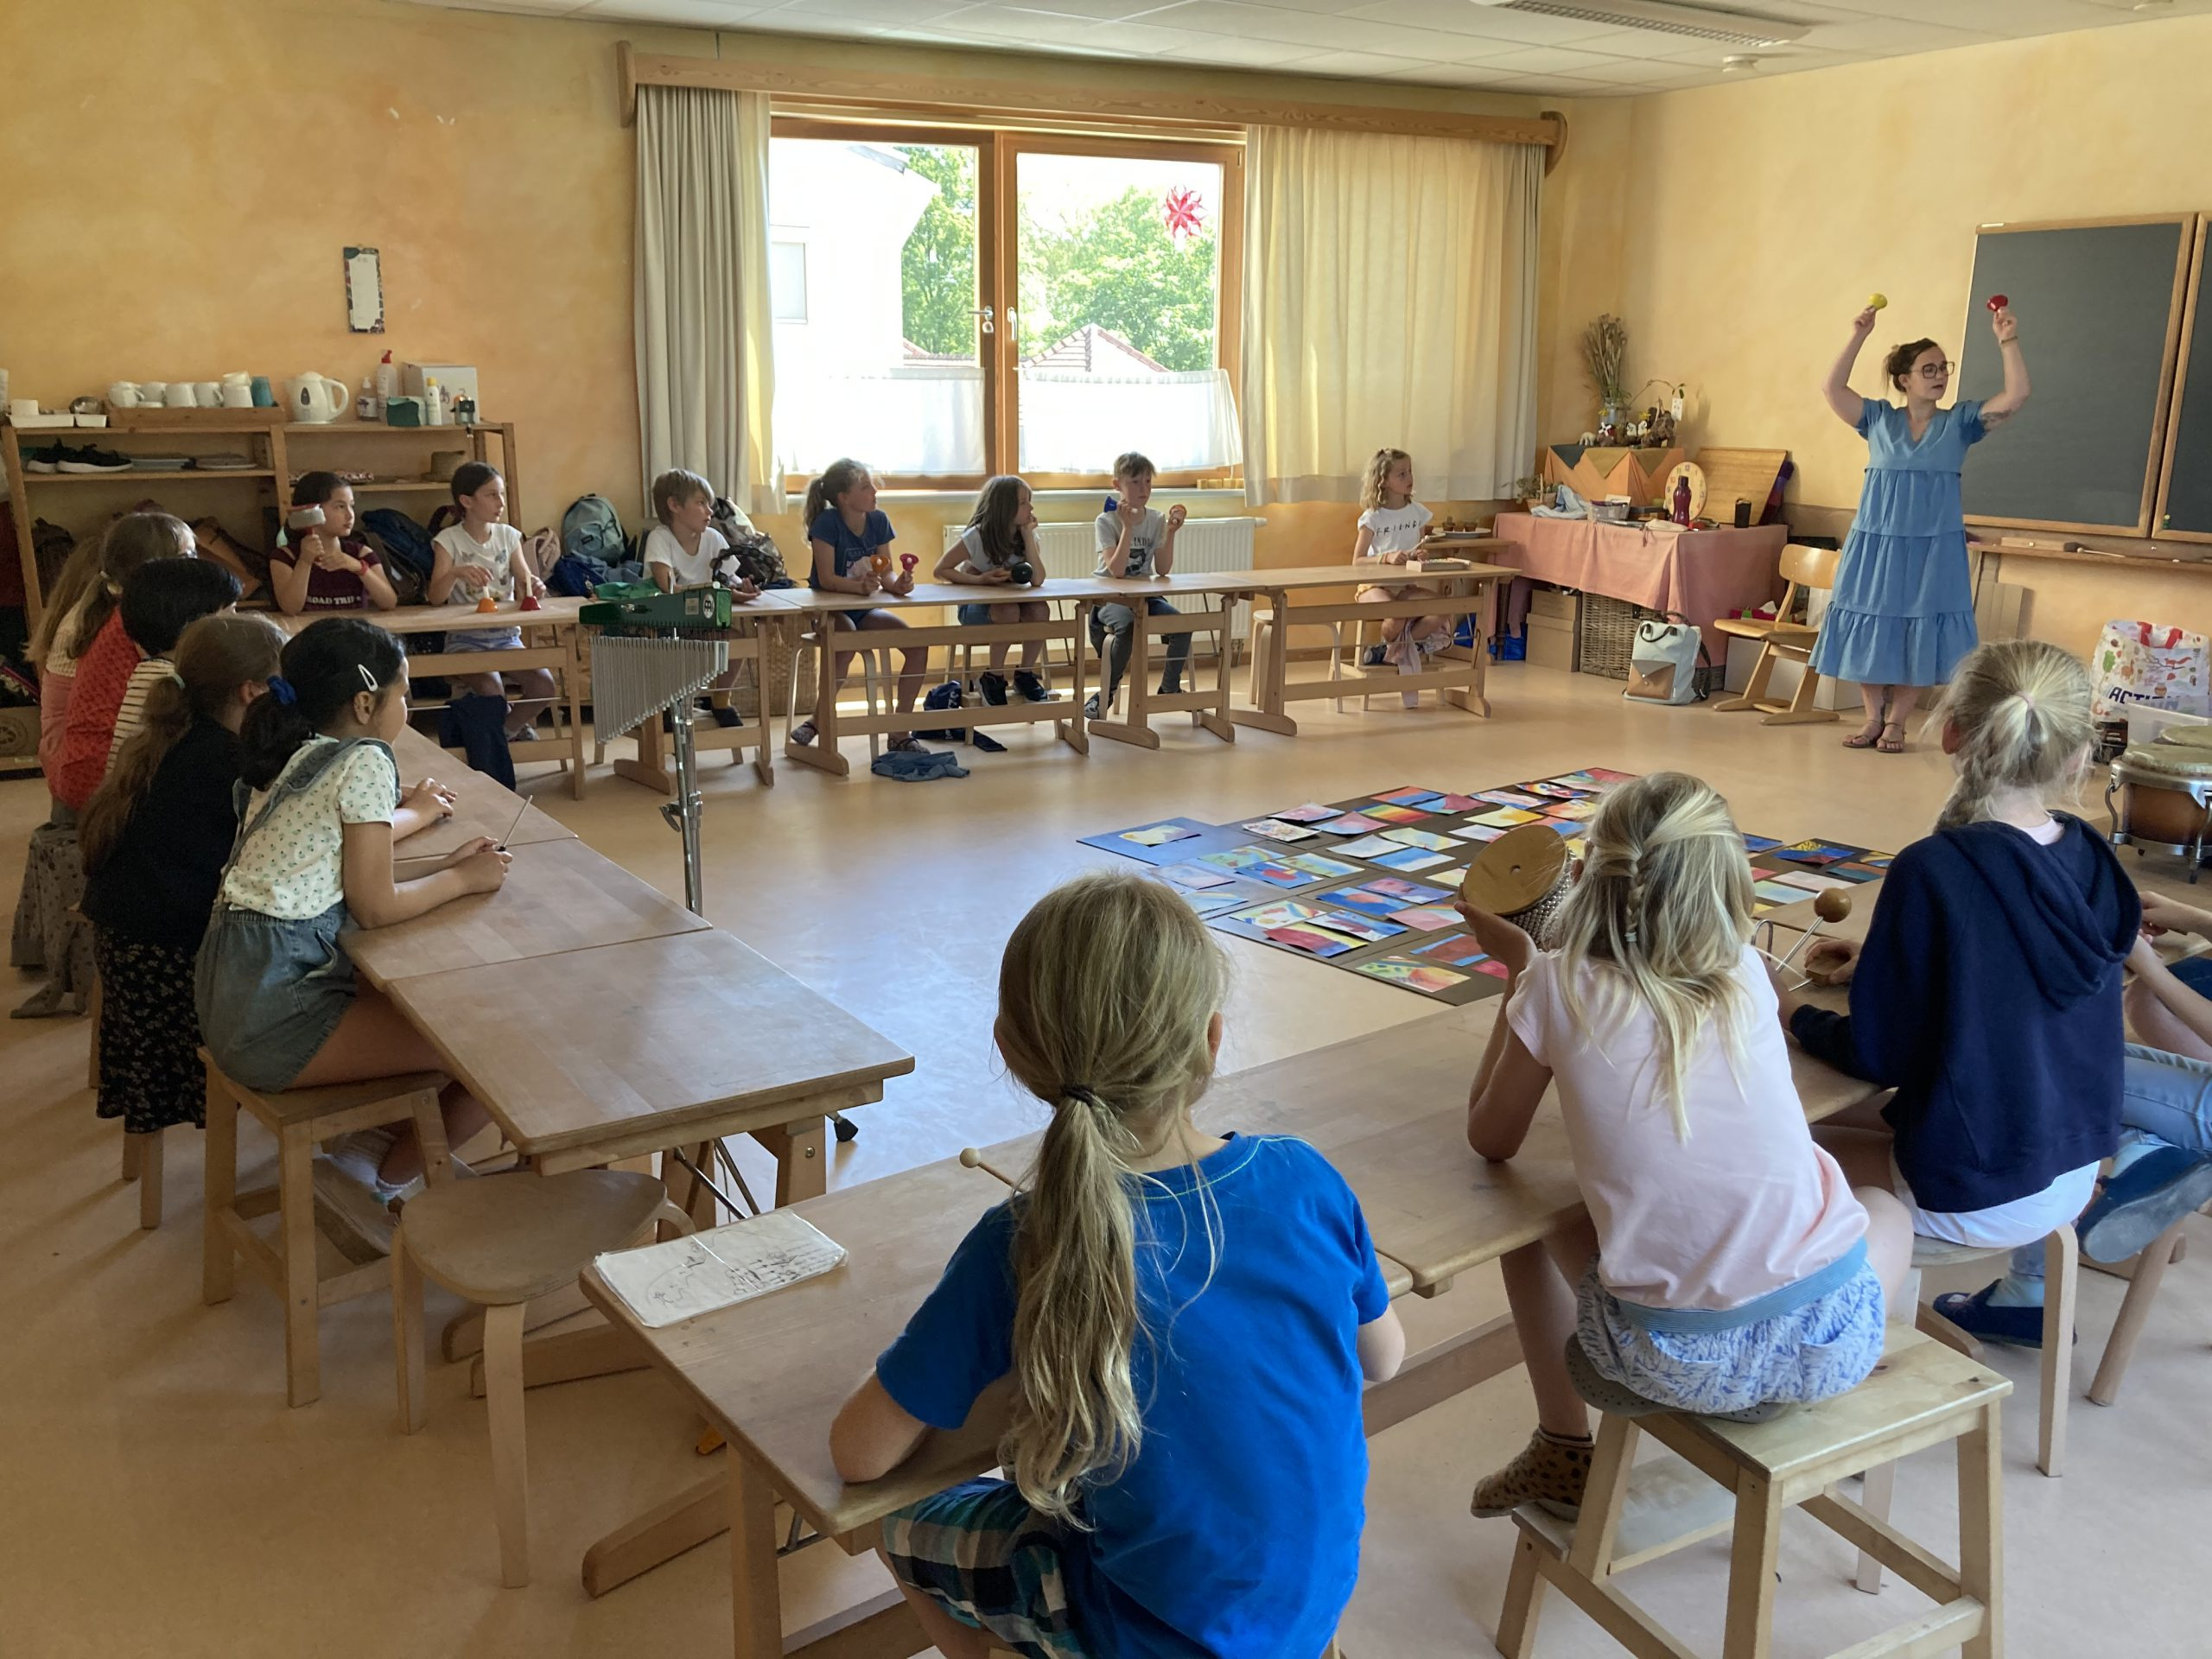 Muziekworkshop – Juf Geertrui